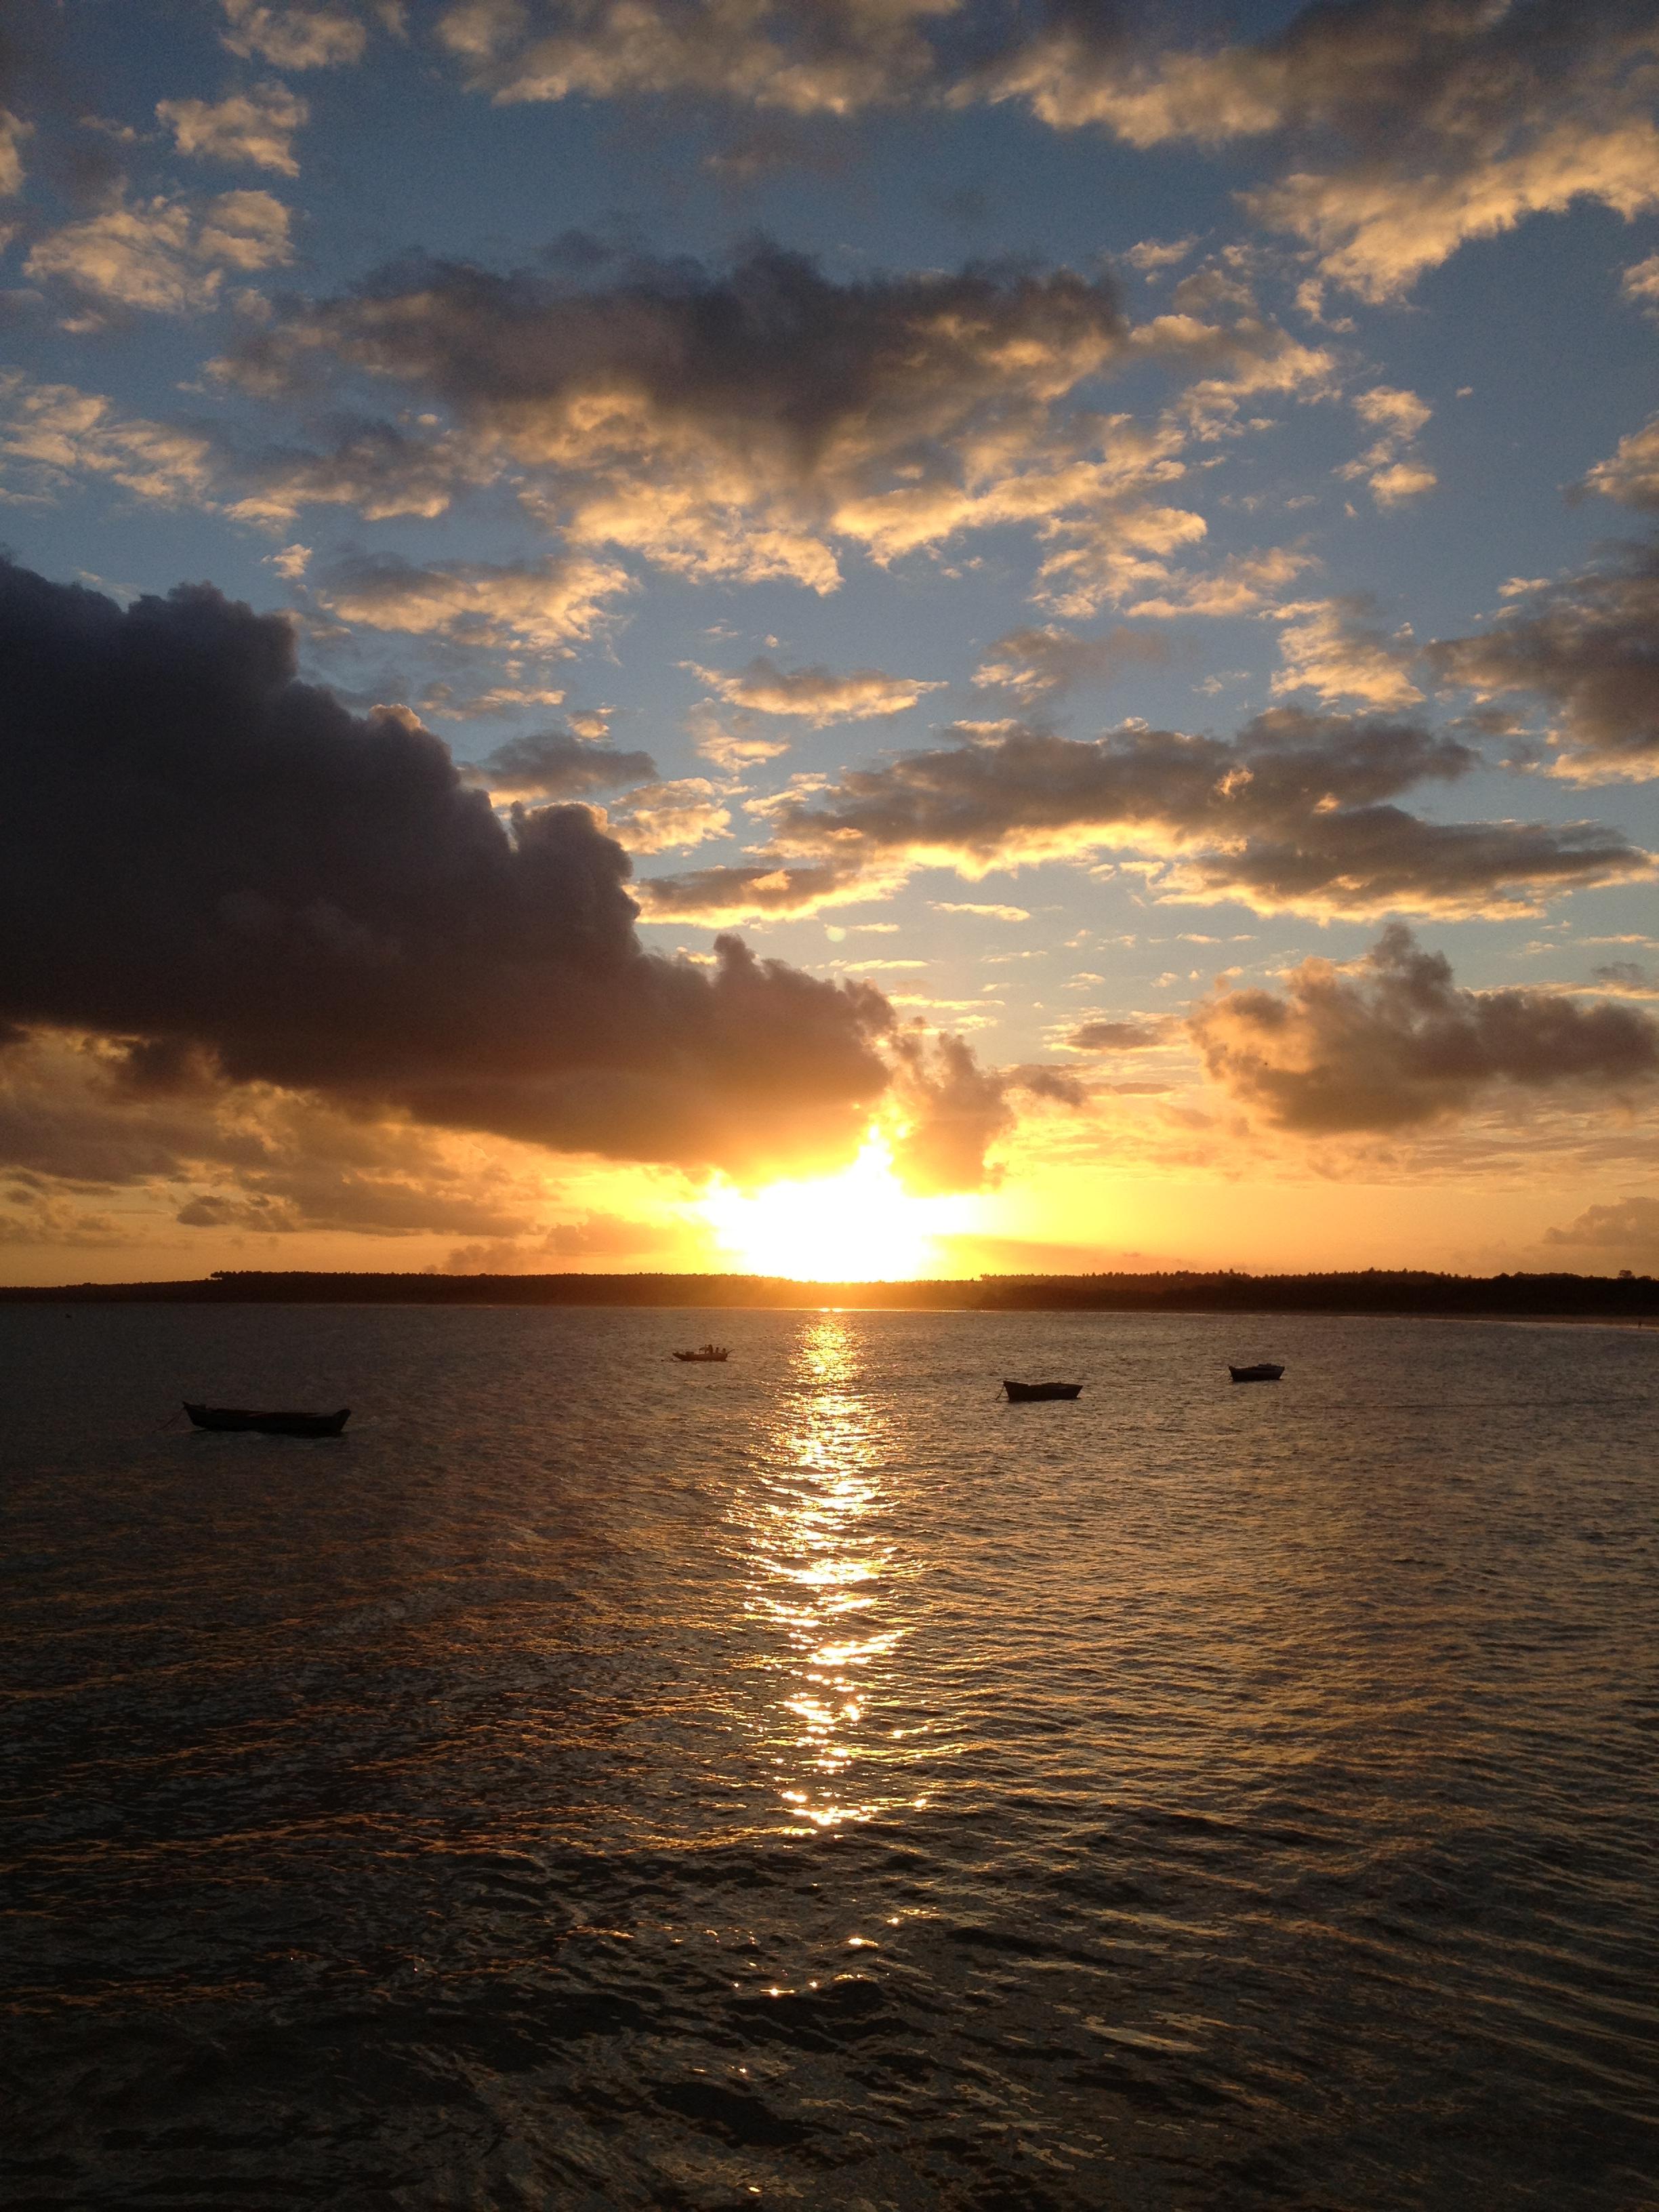 File:Pôr do sol em Pontal do Coruripe.JPG.